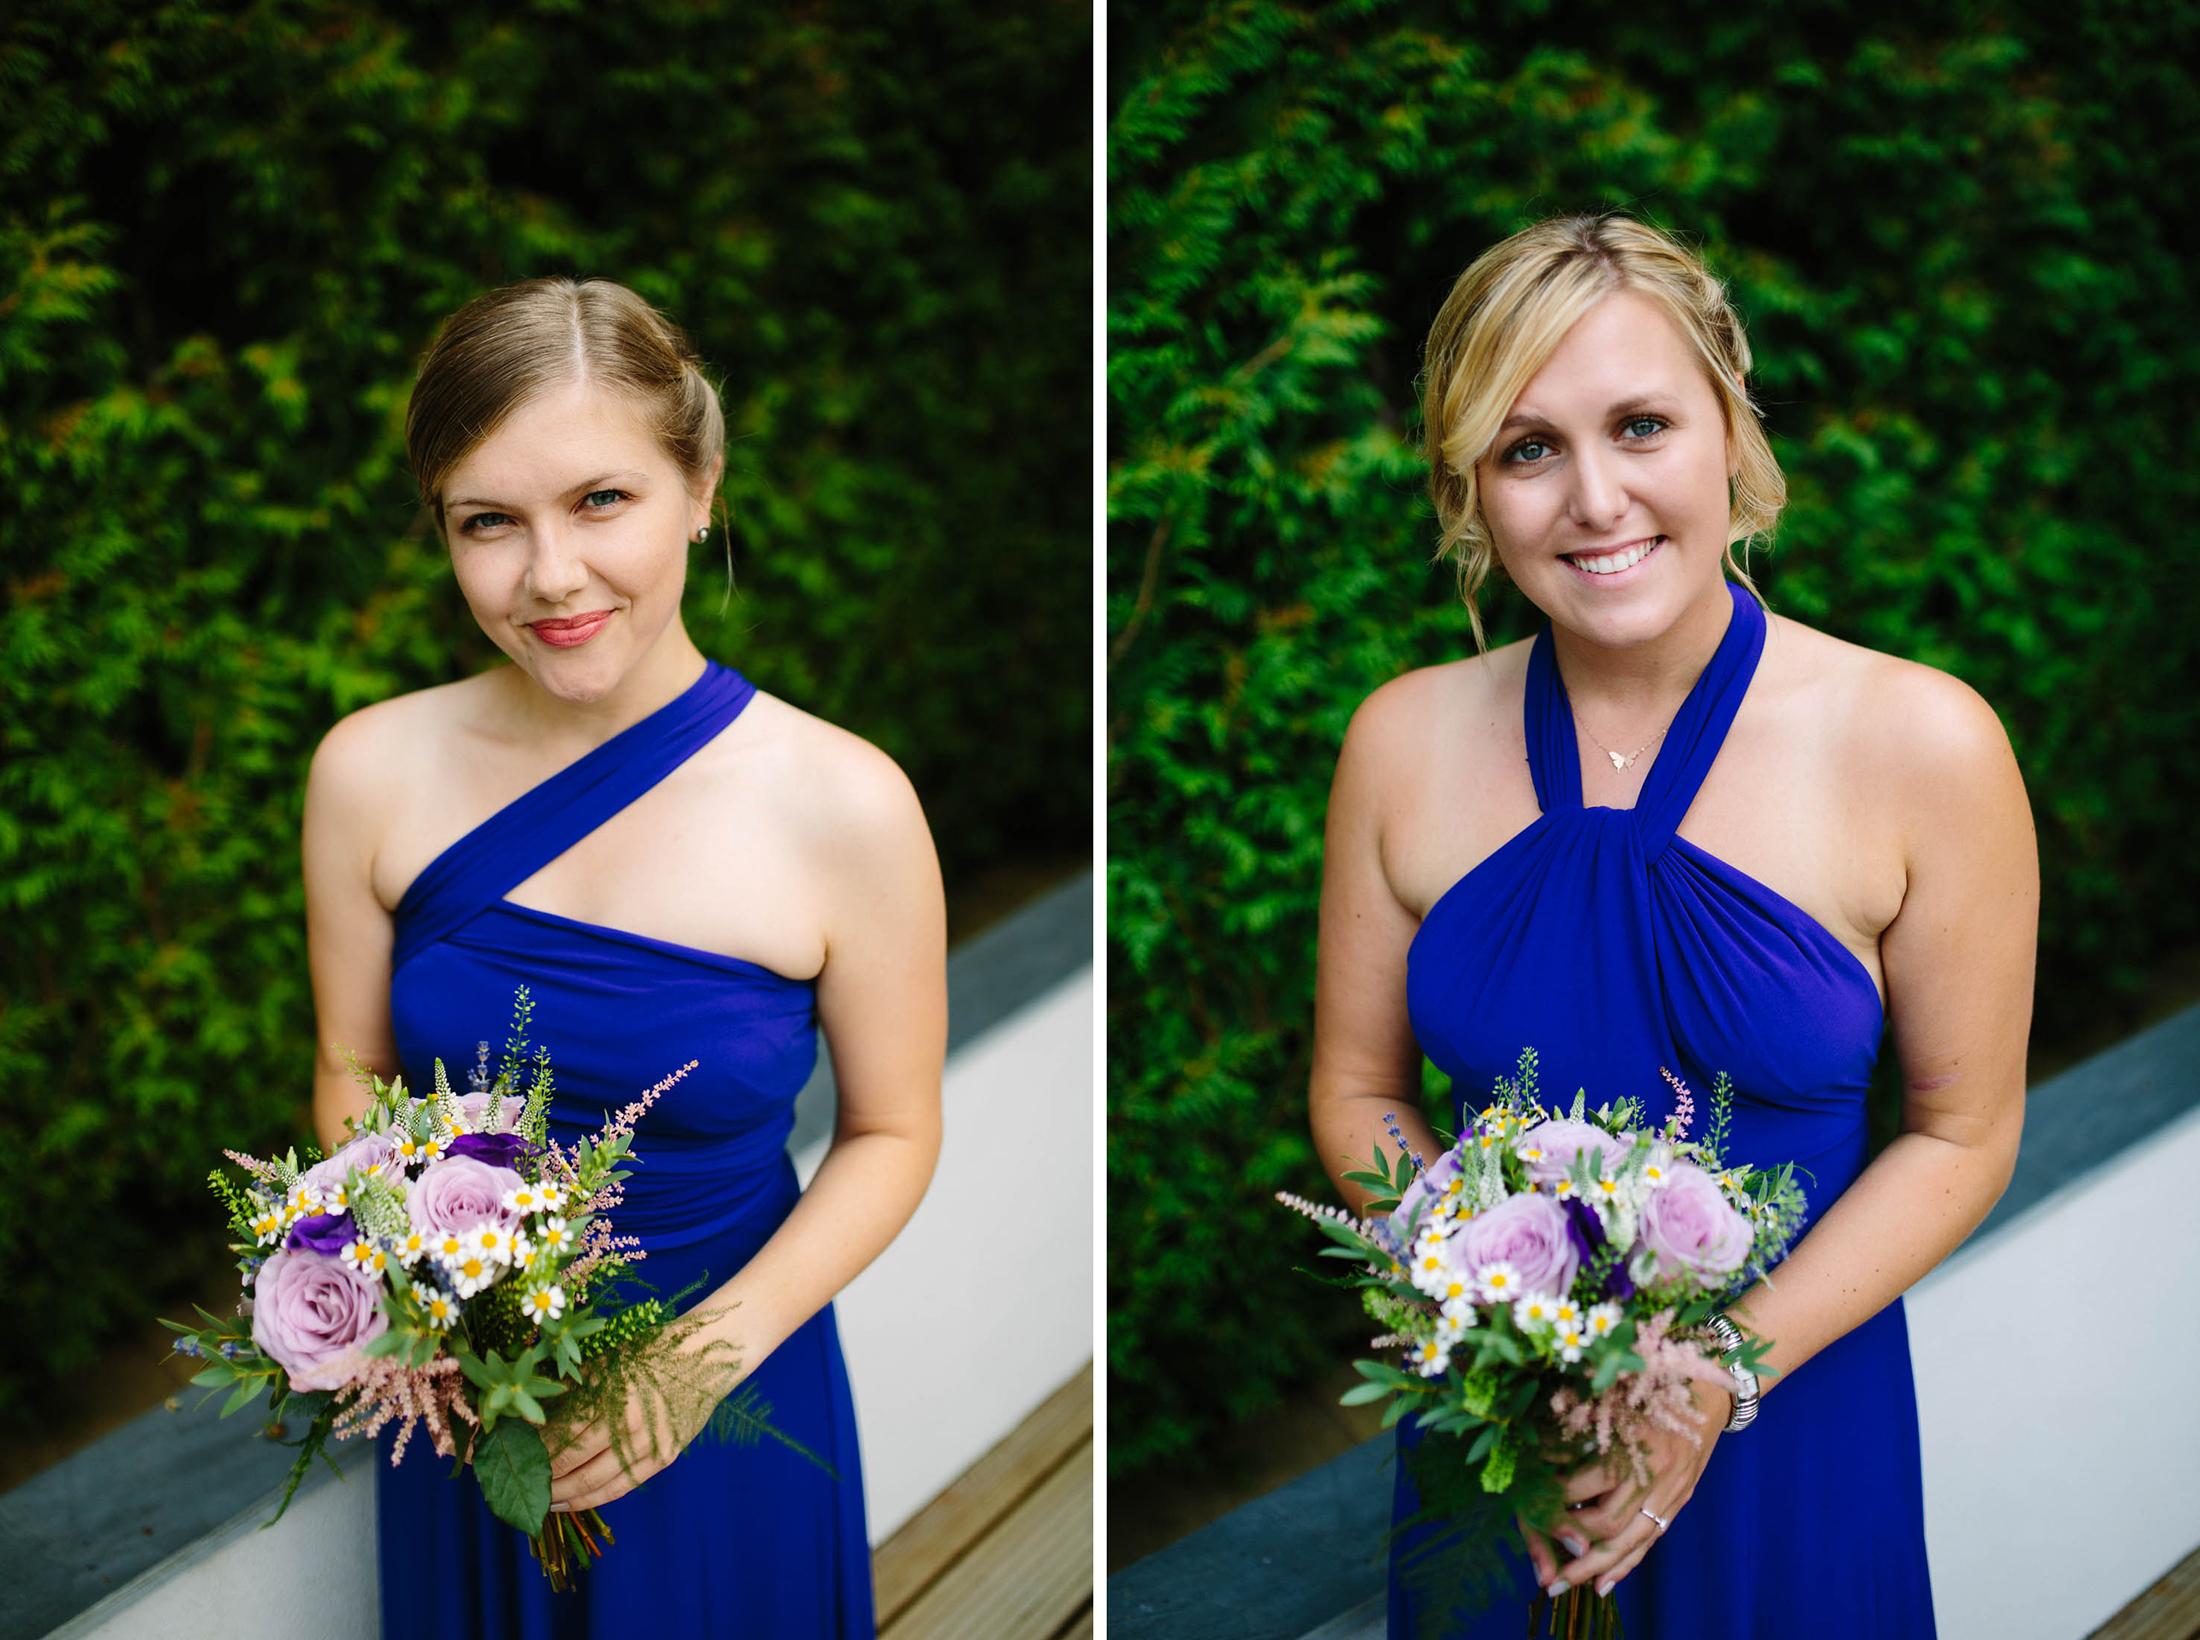 JessicaJillPhotography-HarewoodsHomeFarmWedding-SouthEastWeddingPhotographer-10.jpg